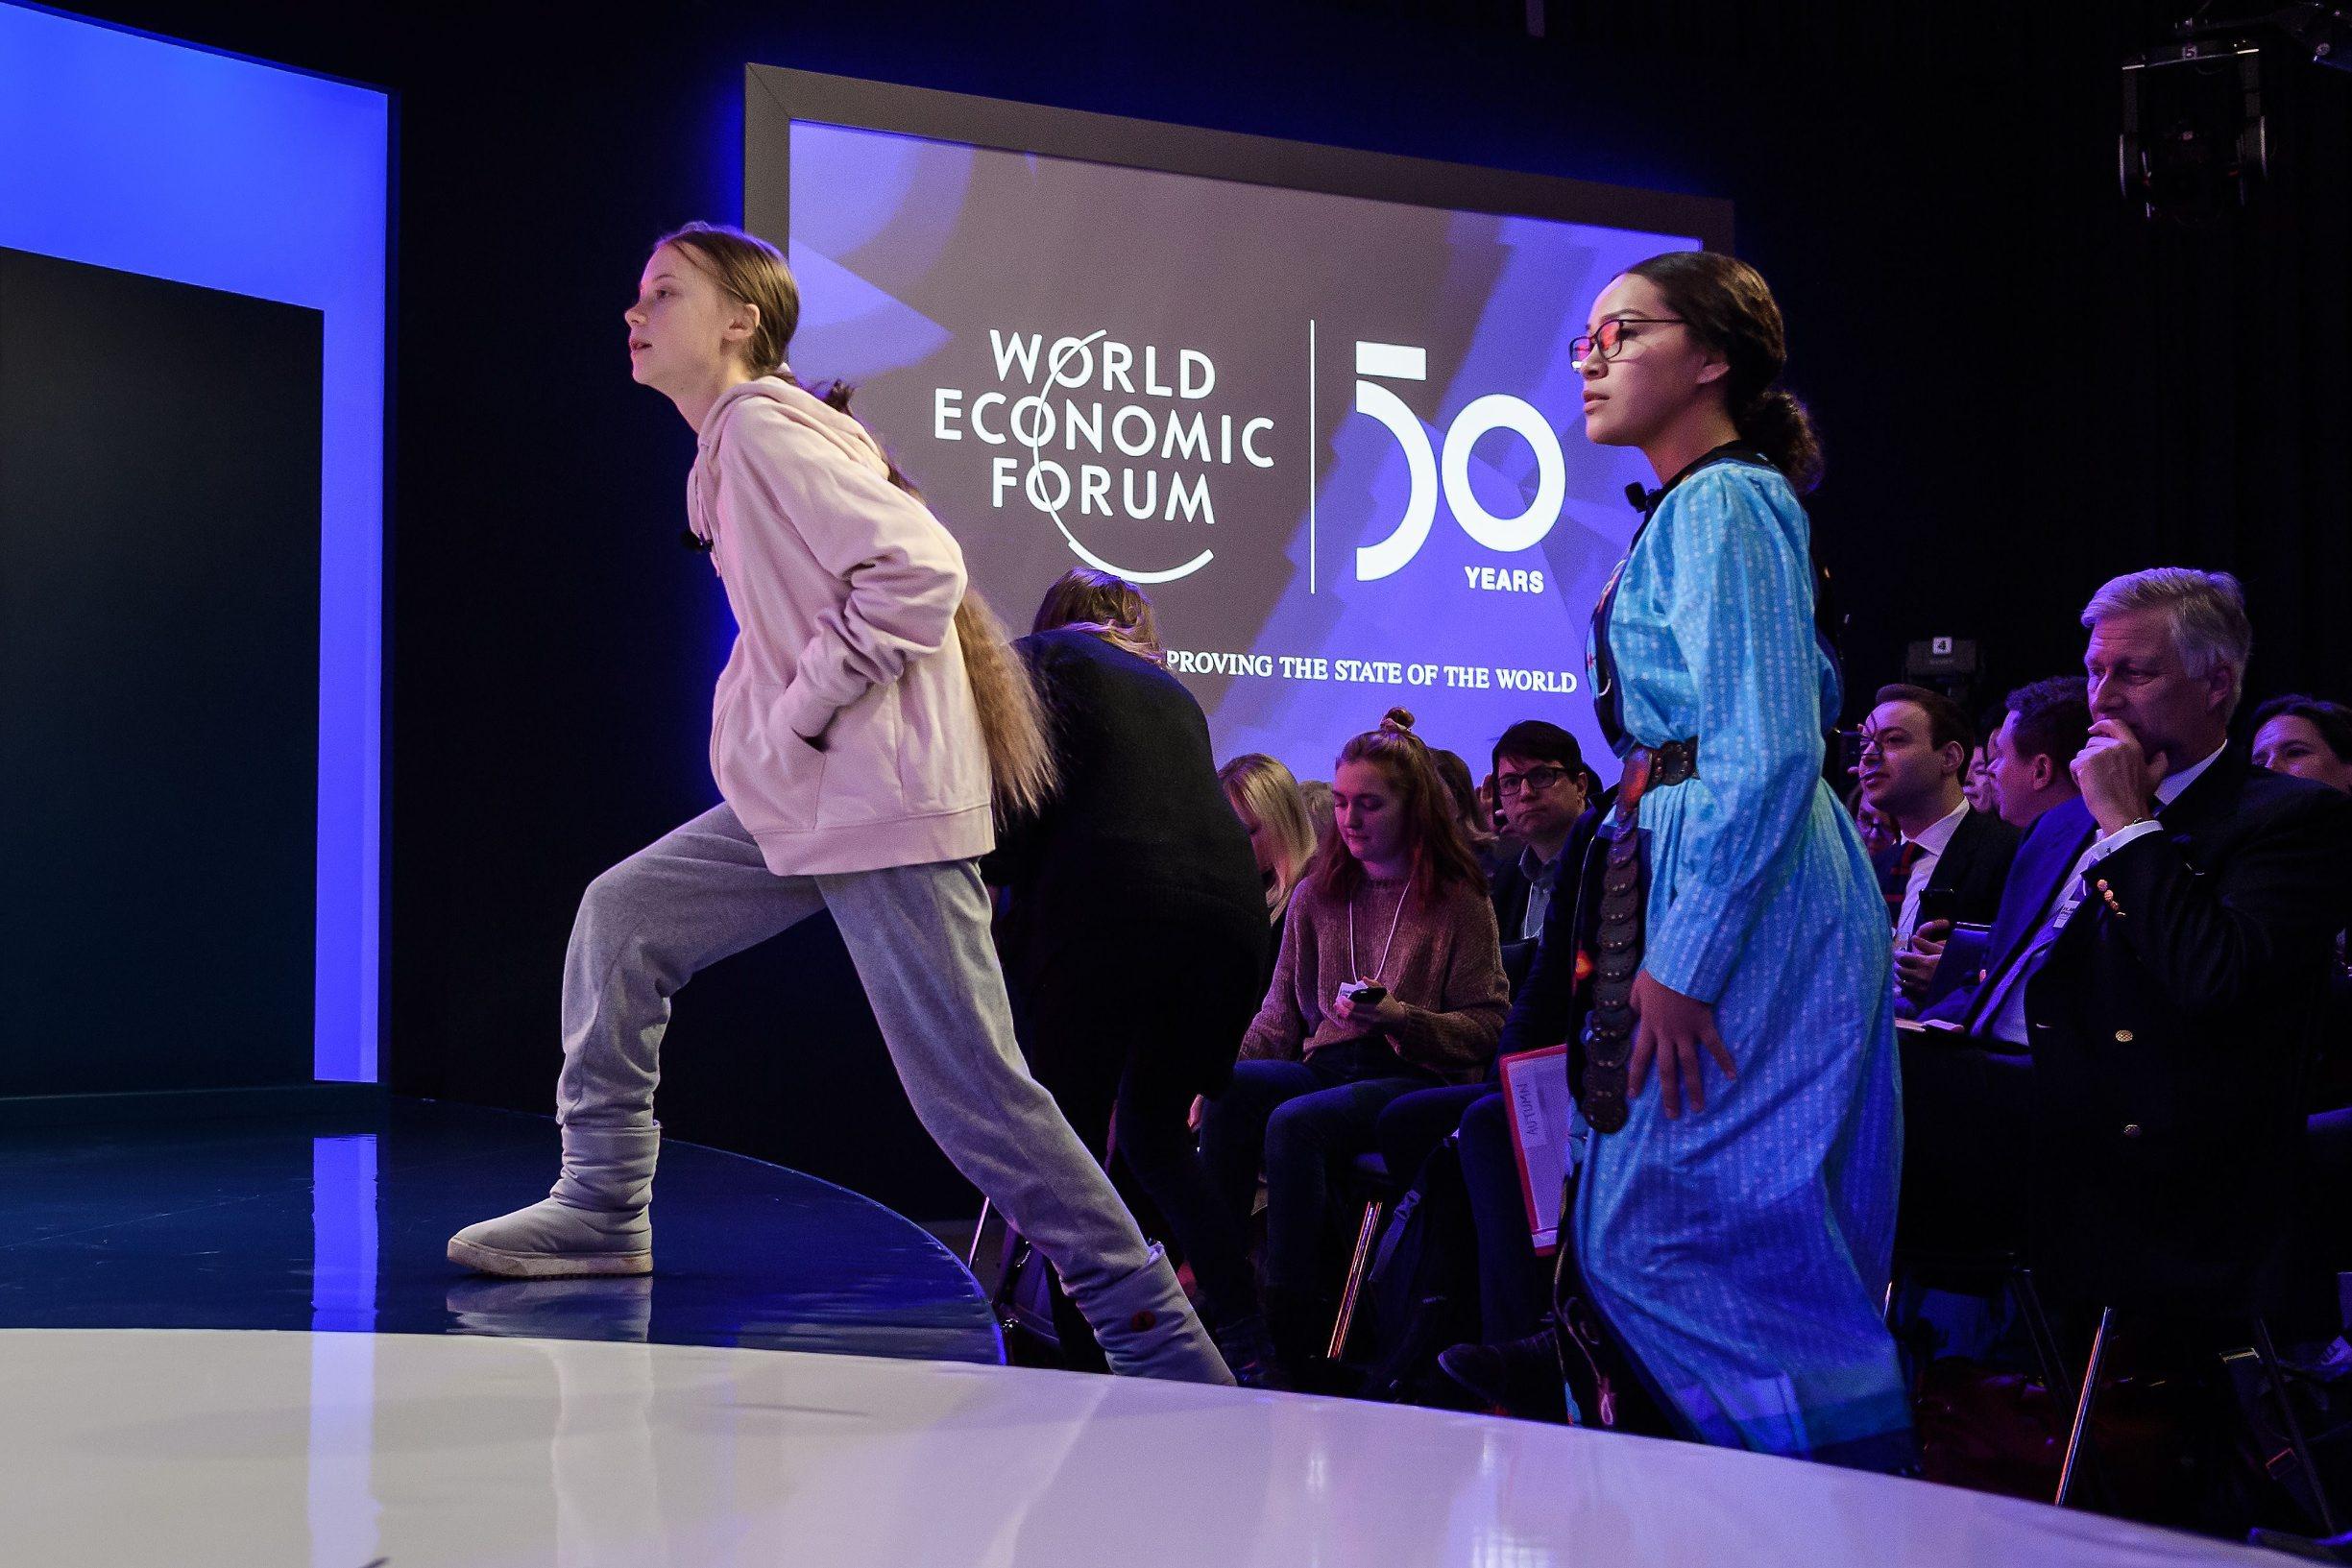 Greta Thunberg i Autumn Peltier